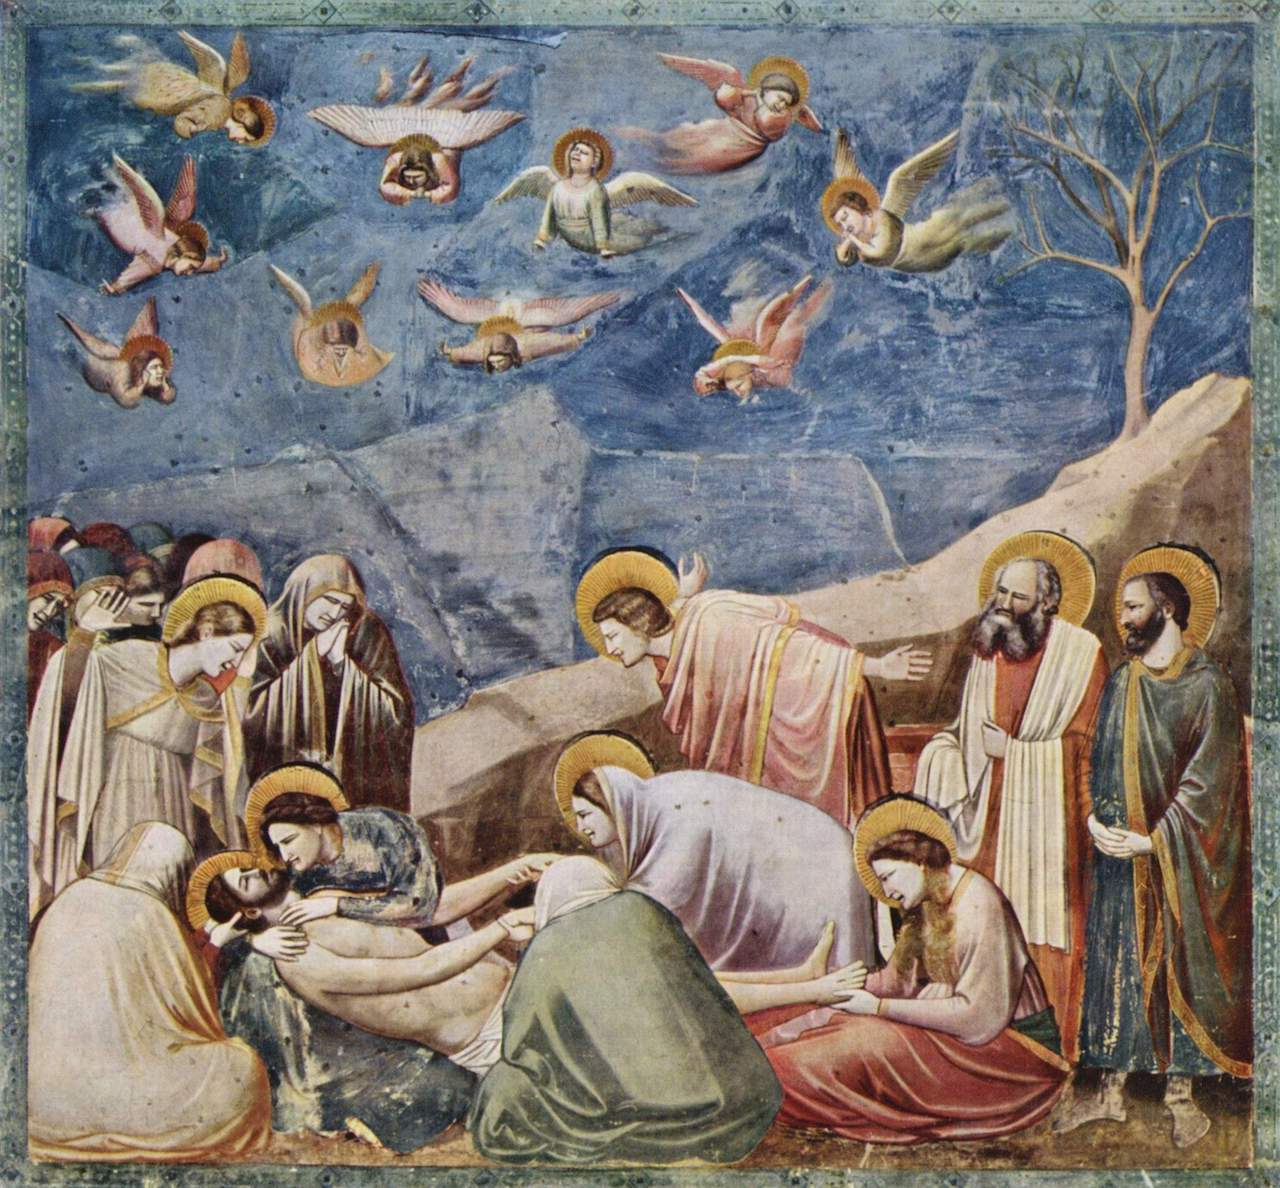 Giotto di Bondone. Beweinung Jesu Christi. 1304-06. Fresko.Cappella degli Scrovegni all'Arena, Padua